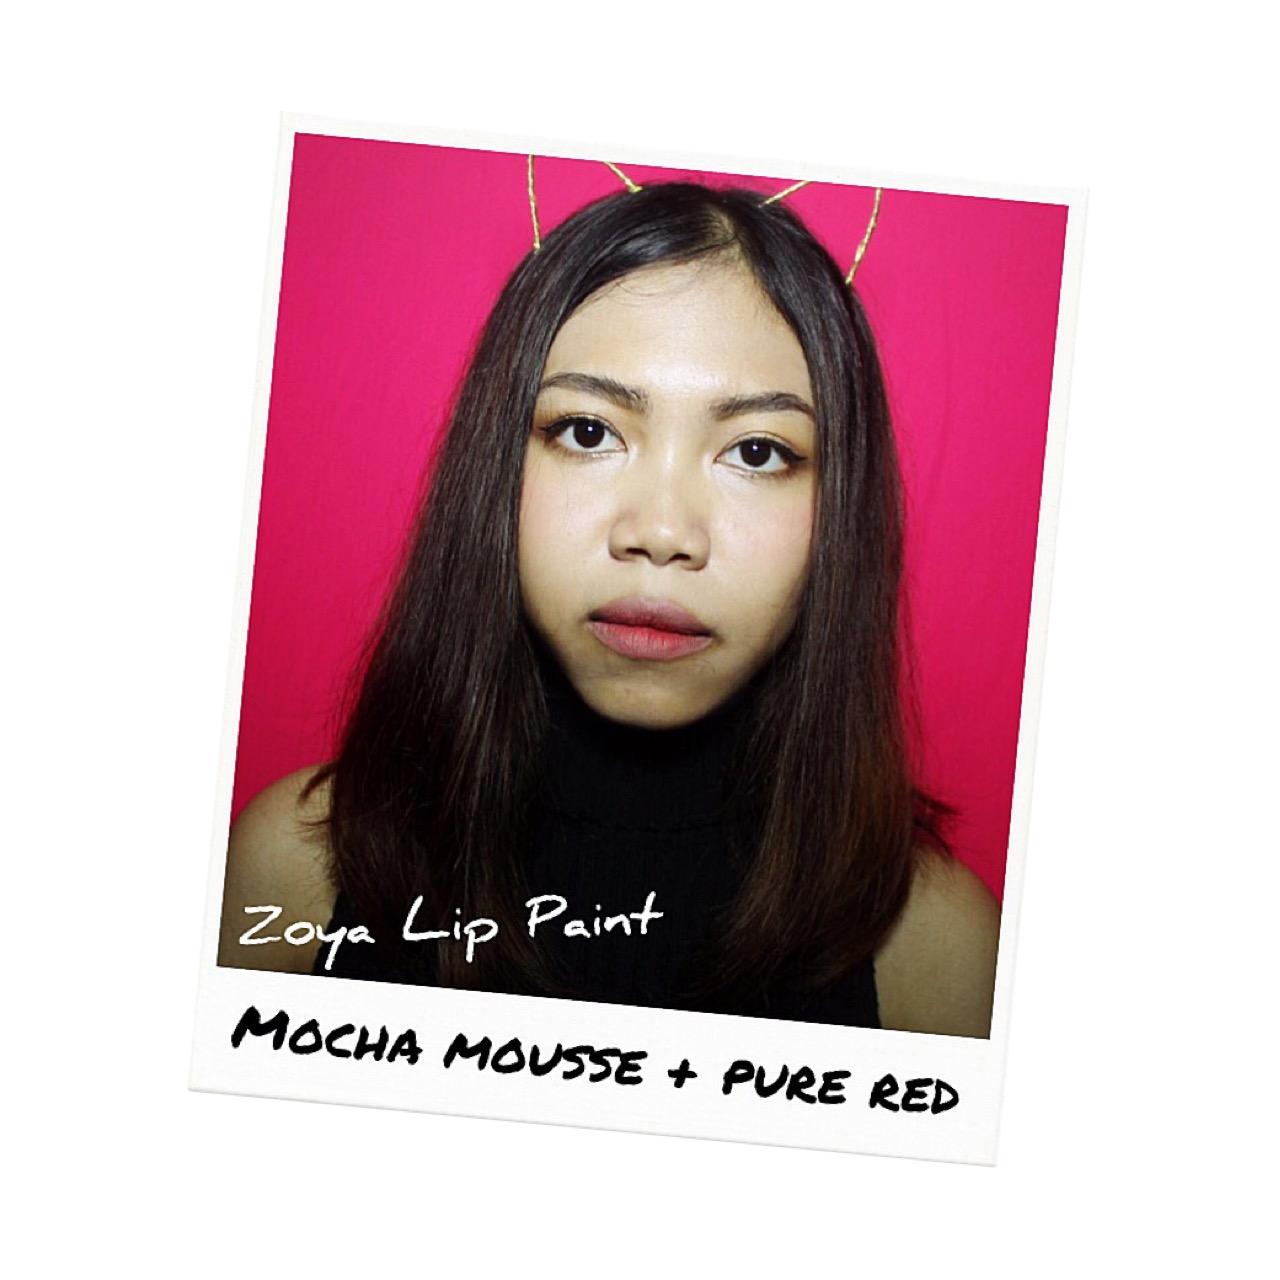 Zoya Lip Paint Pure Red Mocha Mousse Review Adhels Beauty Cafe Ampuni Alis Kananku Yang Kegusrek Part 3